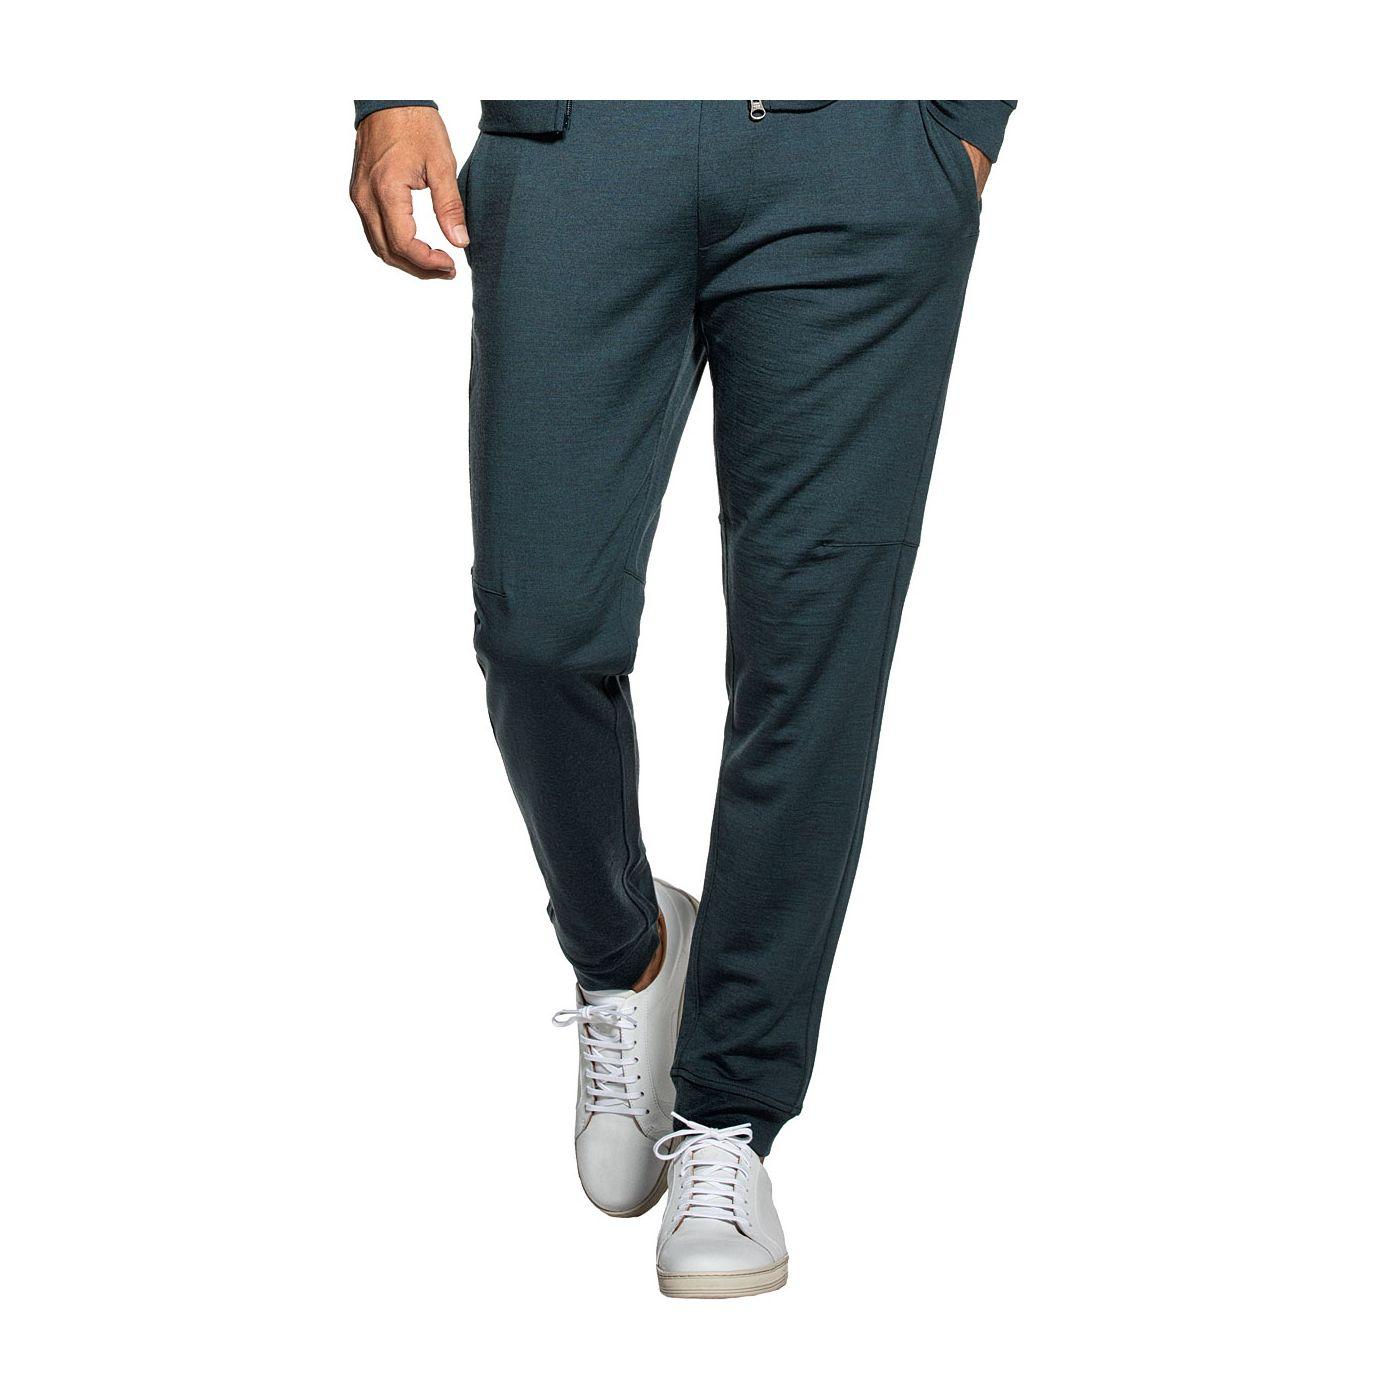 Sweatpants for men made of Merino wool in Blue green